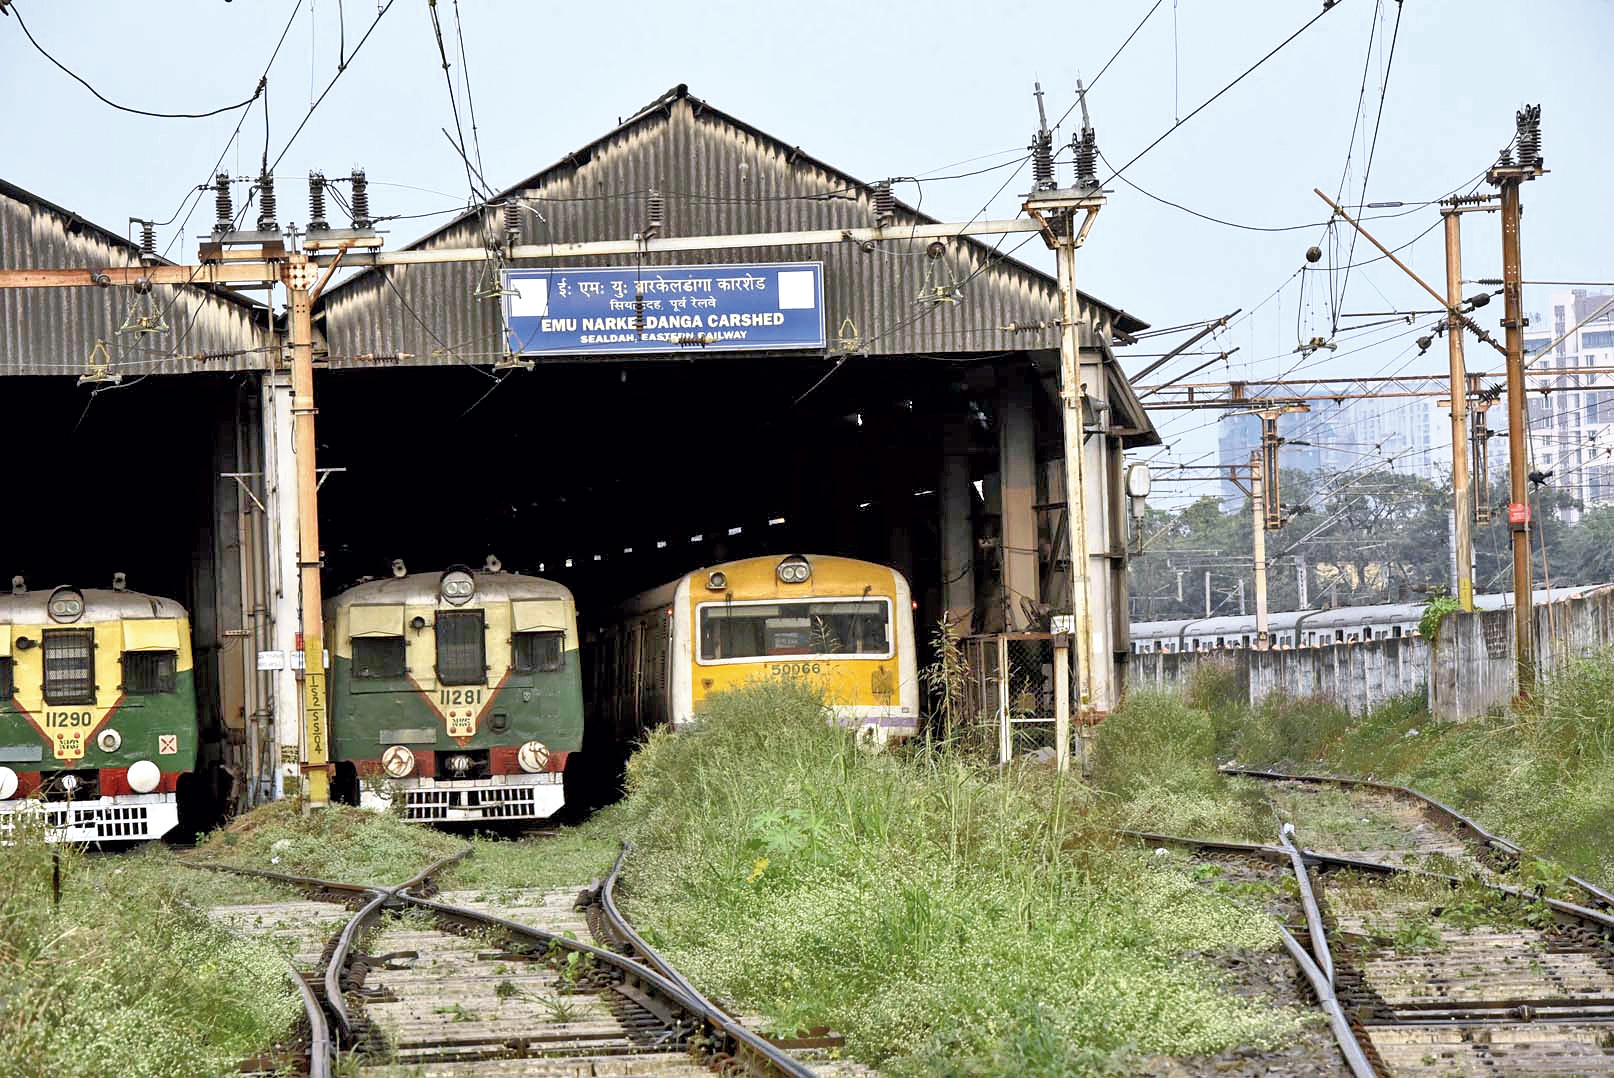 The Narkeldanga car shed where Trinankur Nag was electrocuted on Saturday.